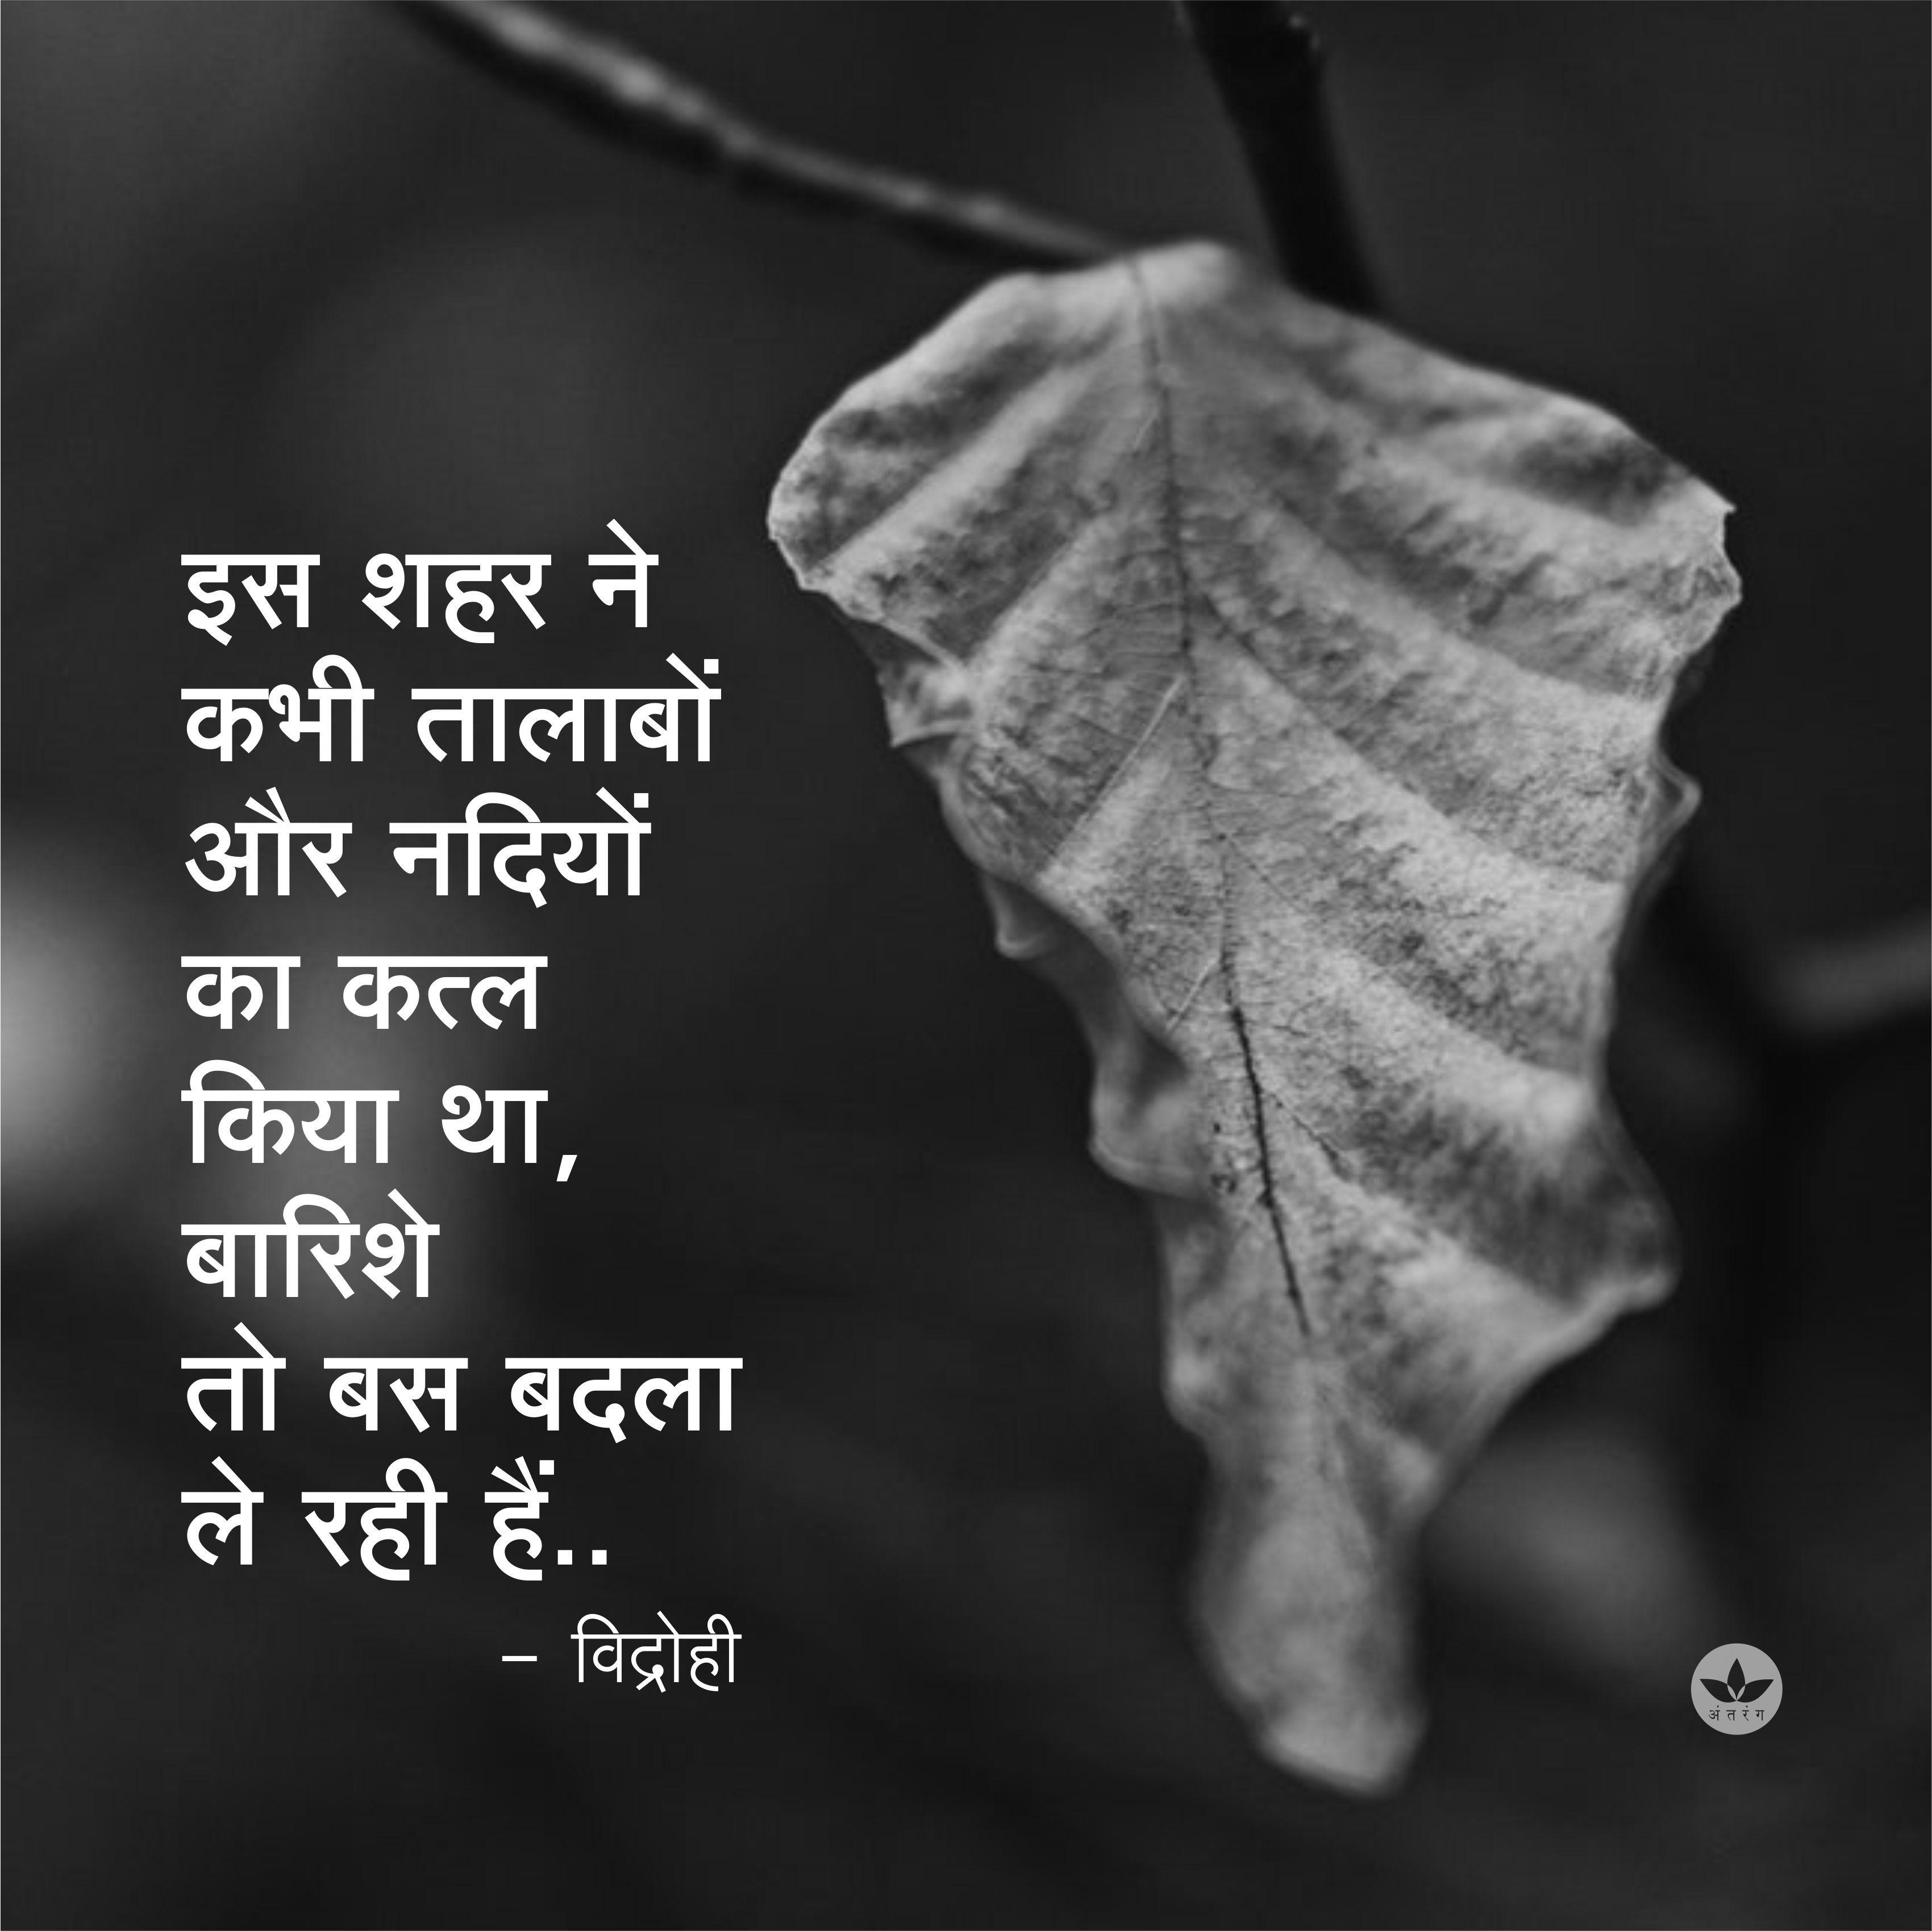 Pin by Nilesh Gitay on Shayari Touching words, Hindi